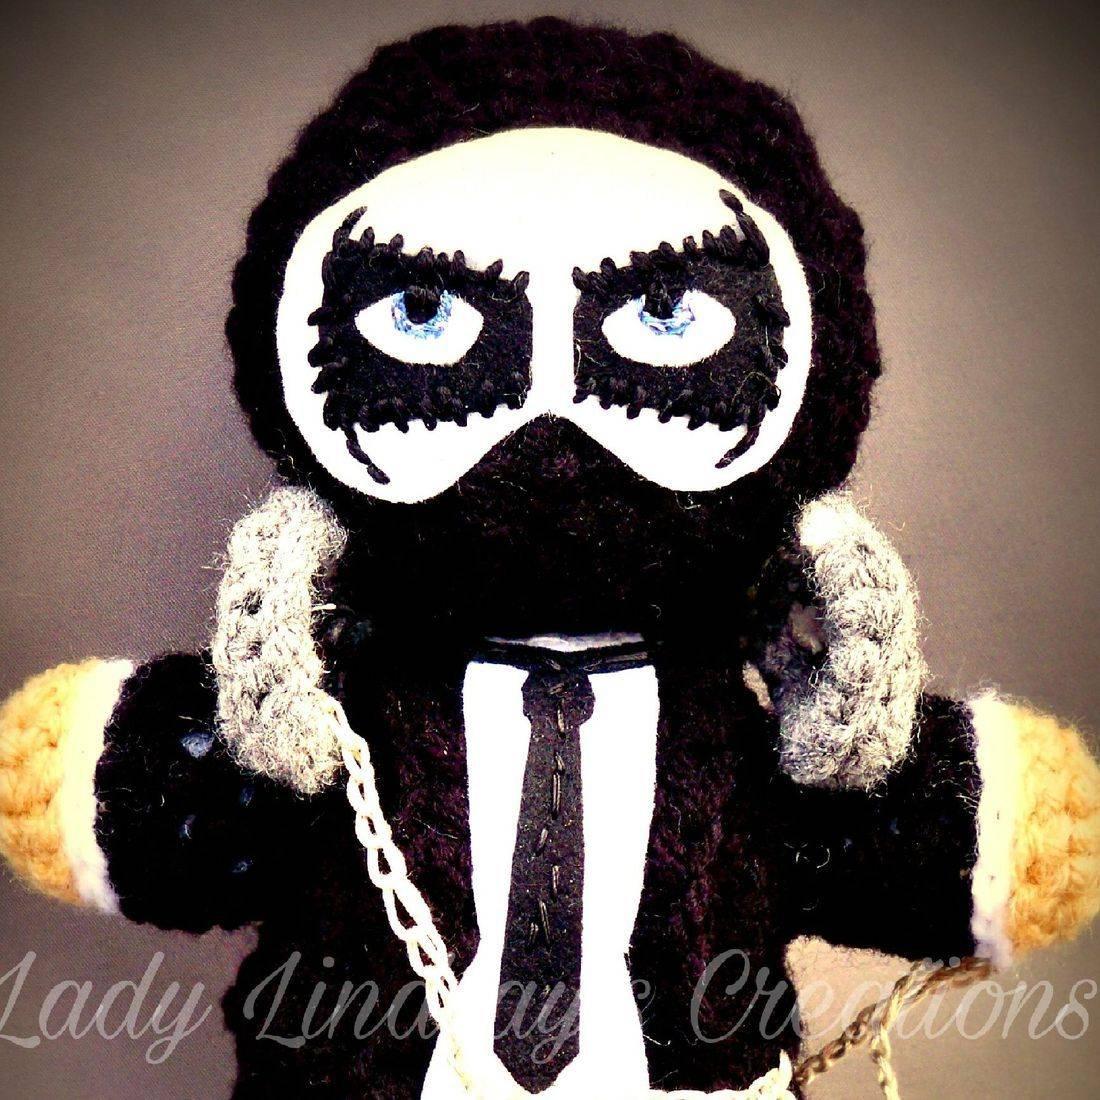 Moth Rider, Commission, Custom, Crochet, Amigurumi, Plush, Doll, Handmade, handcrafted, craft, artisan, art, paint, Shop Small, Villain